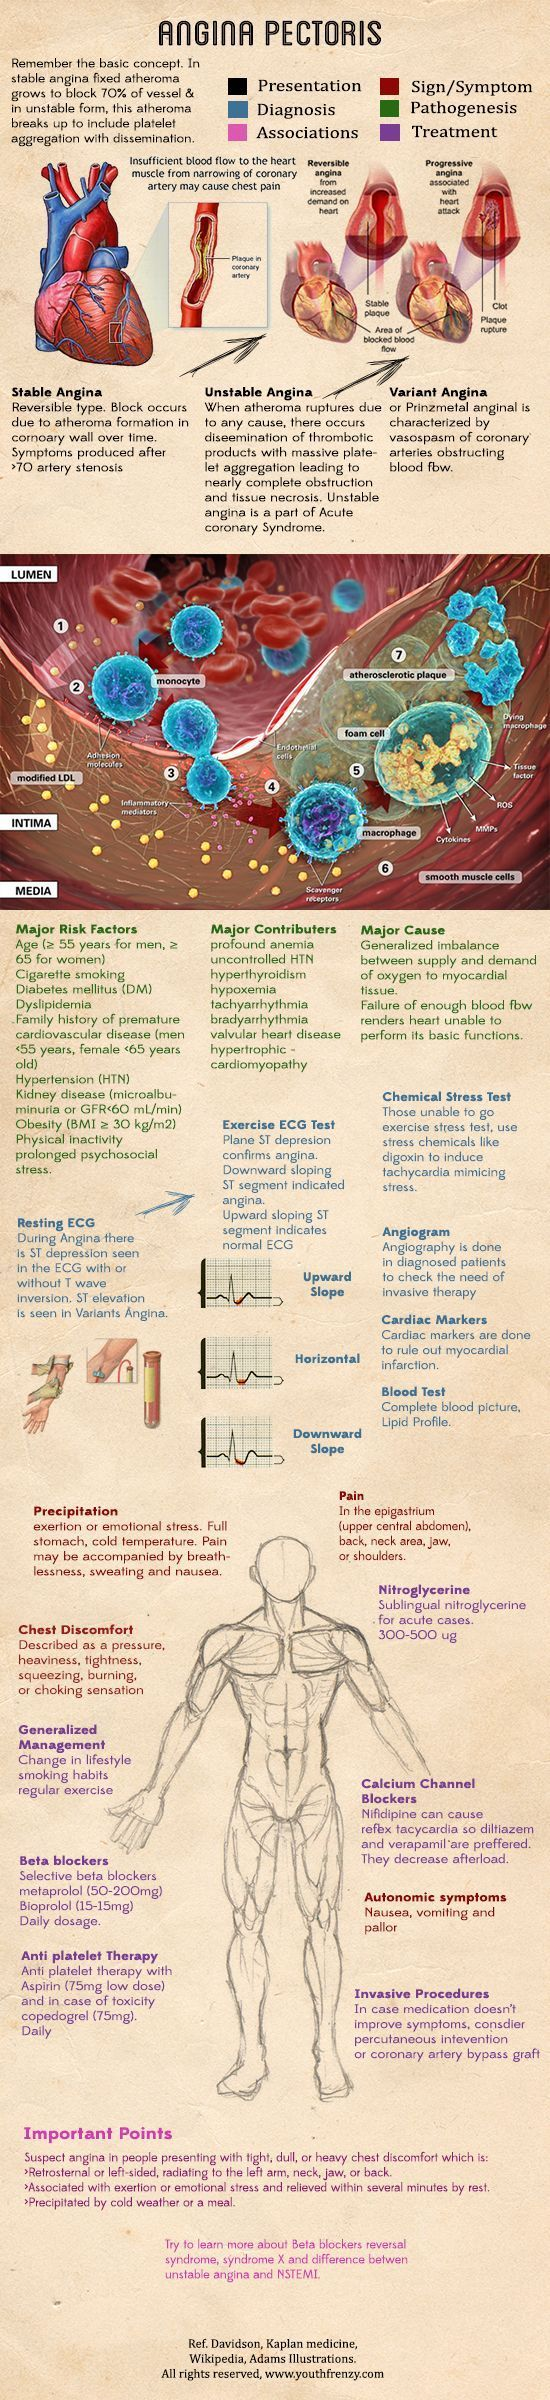 angina pectoris basic concept, causes, diagnosis, management and prognosis illustration